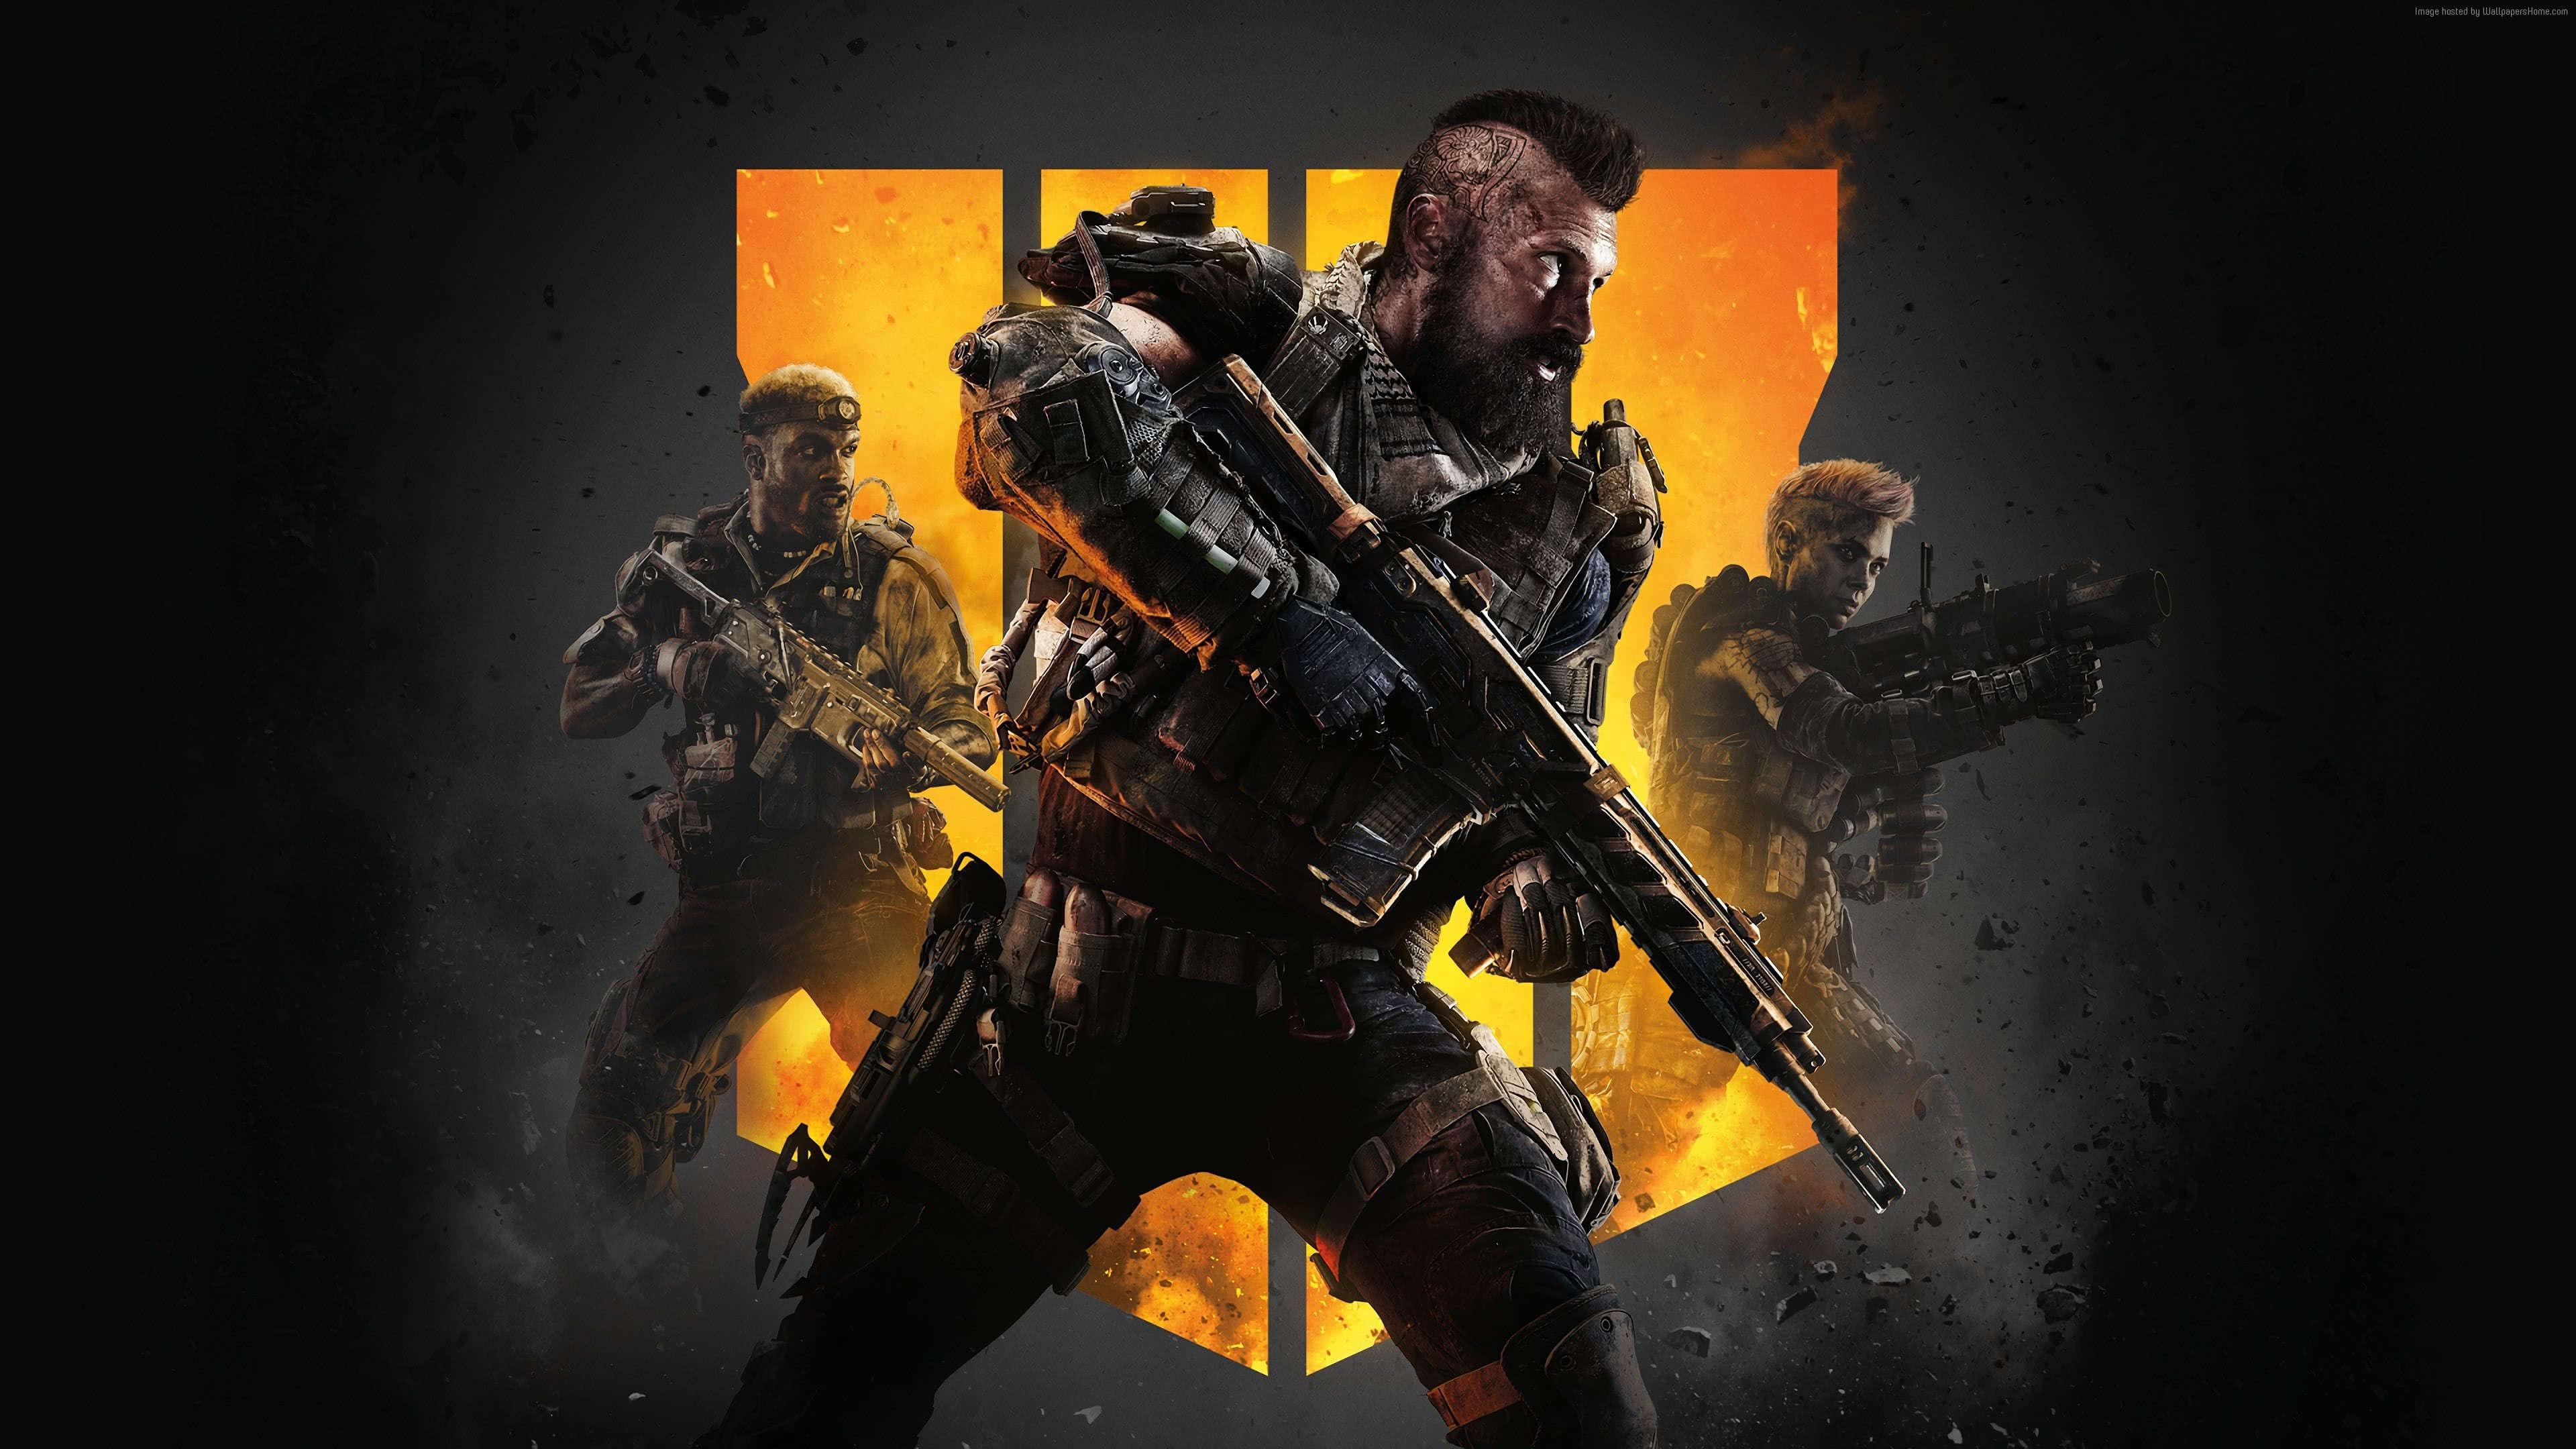 Call Of Duty Black Ops 4 Cover UHD 4K Wallpaper - Pixelz.cc